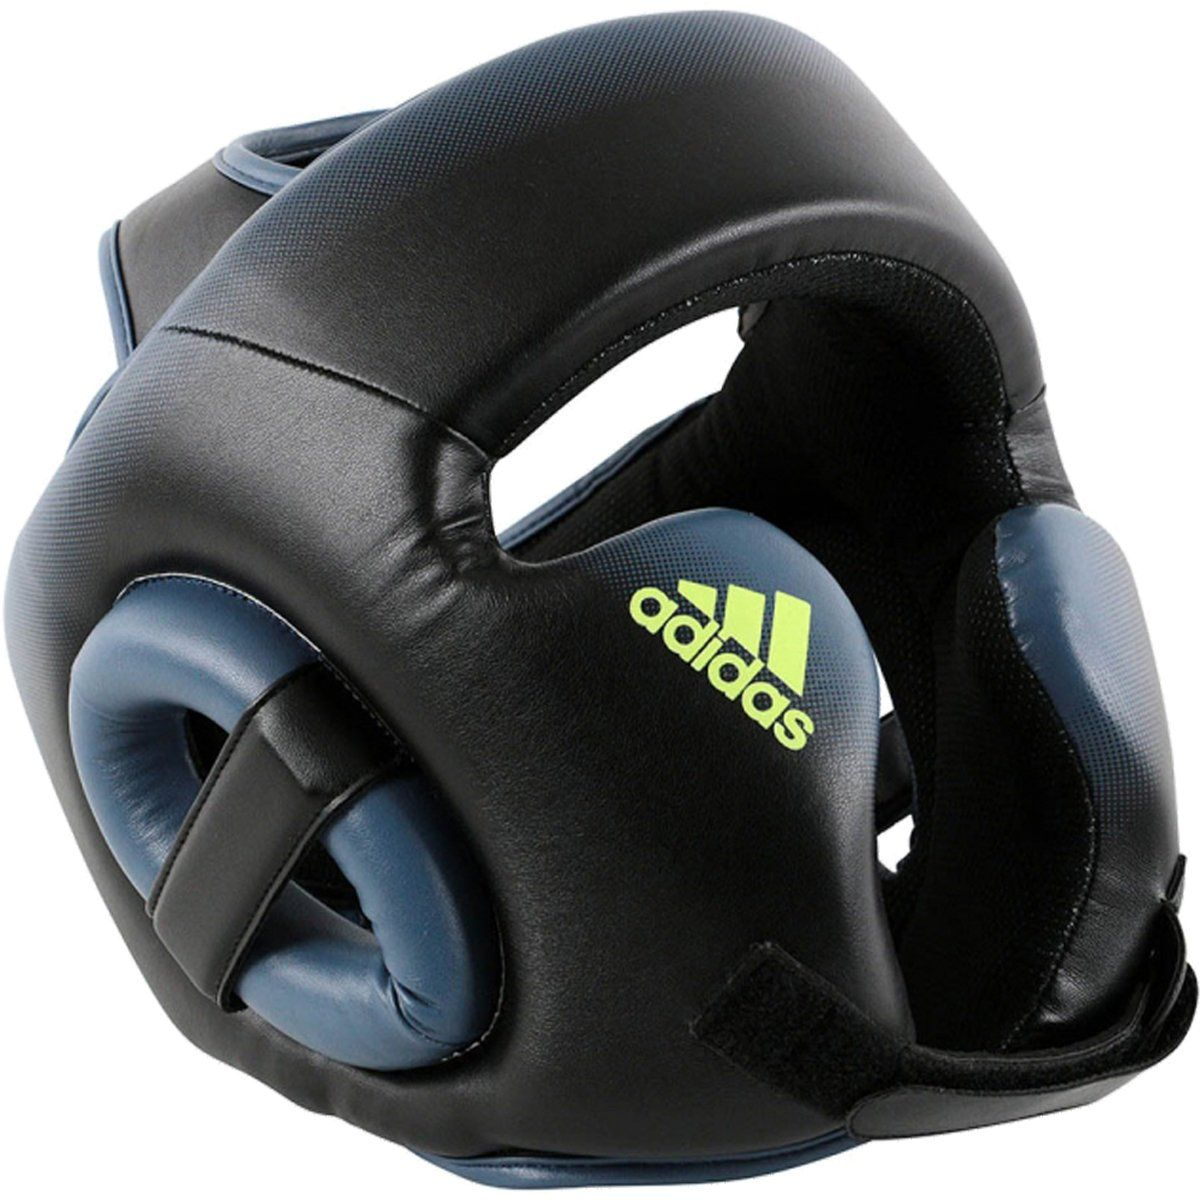 adidas Speed Headguard Amazon.co.uk Sports & Outdoors